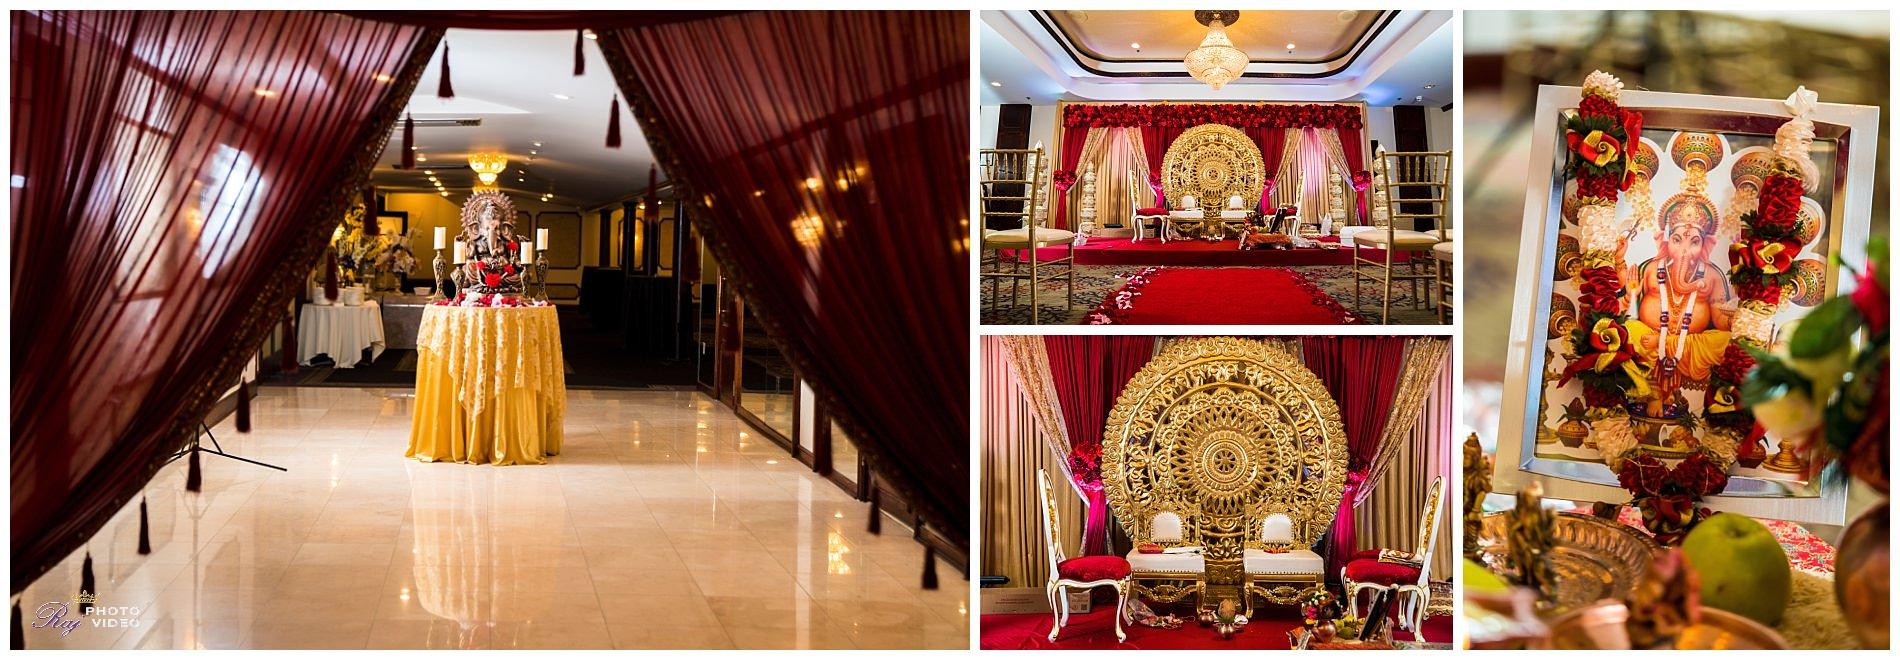 Martinsville-Gardens-NJ-Indian-Wedding-Ruchi-Vishal-15.jpg